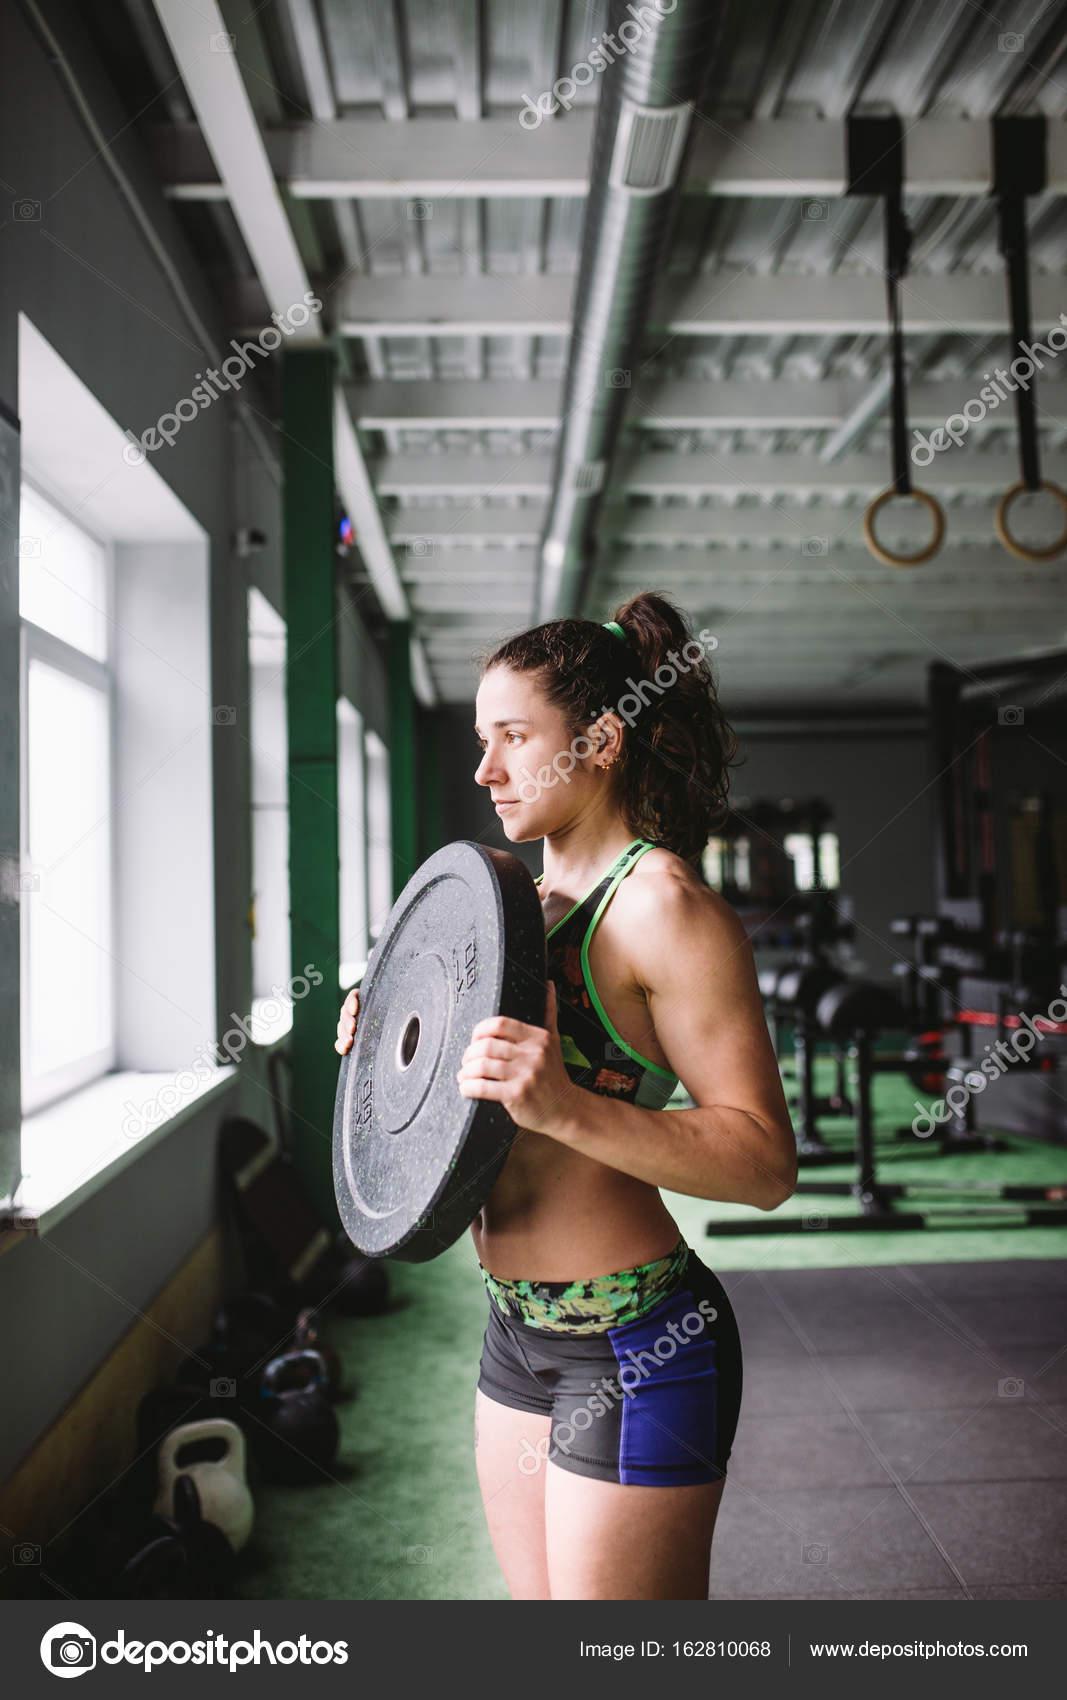 Картинку мускулистой девушки